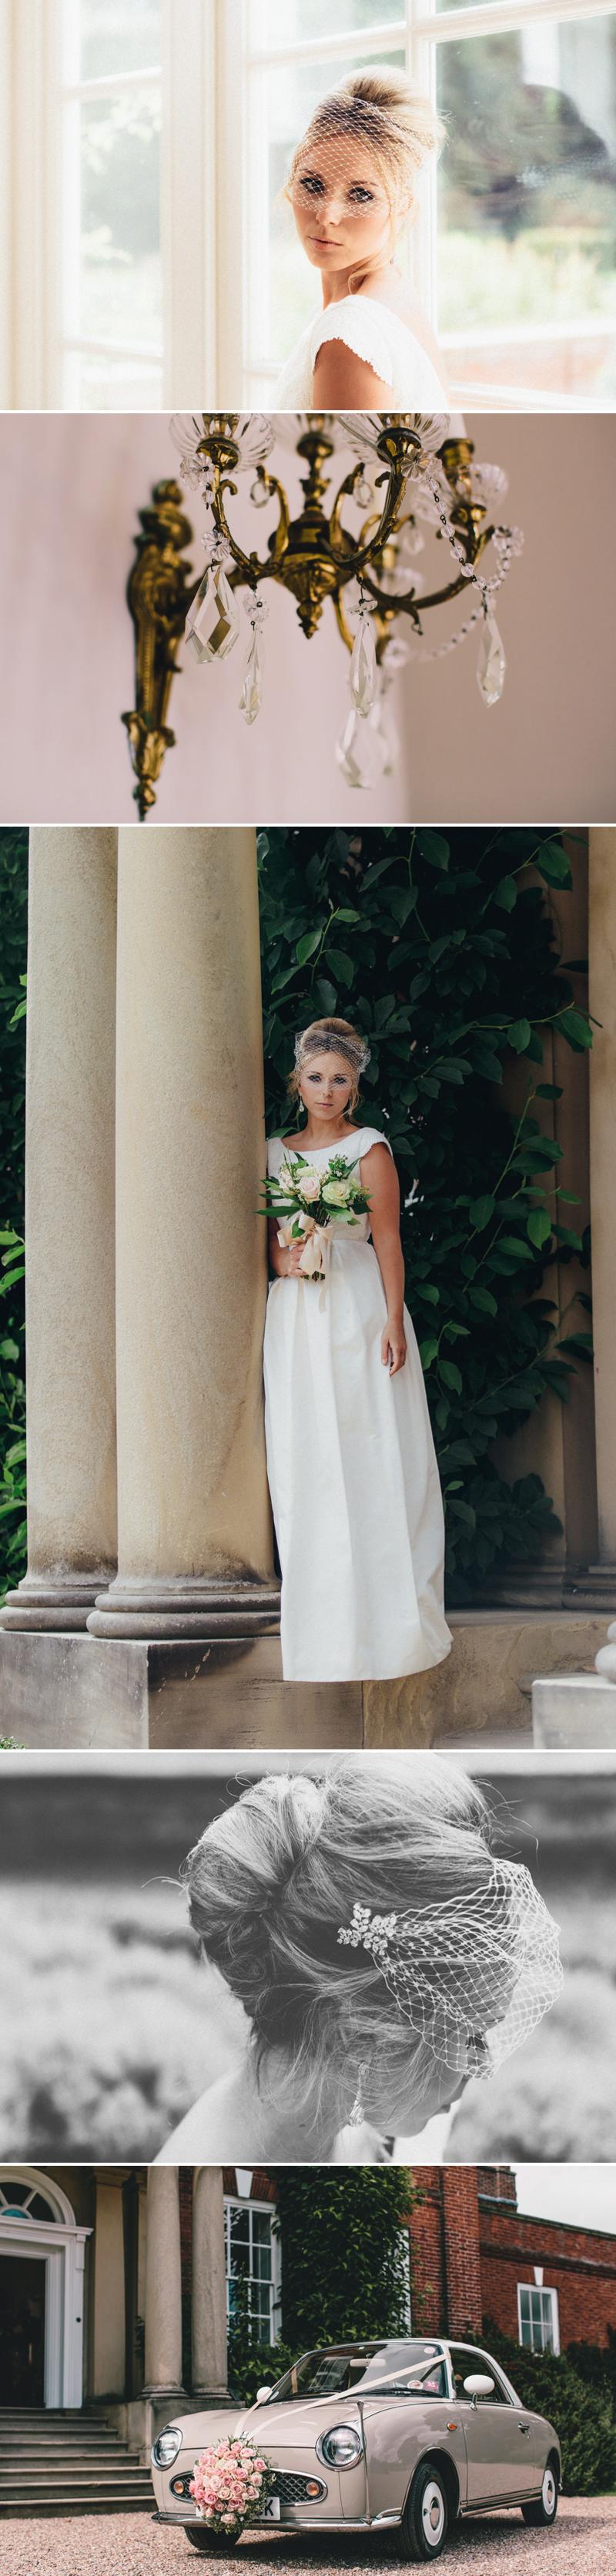 modern-vintage-bridal-boudoir-shoot-iscoyd-park-la-jolie-mariee-coco-wedding-venues-katrina-otter-weddings-007